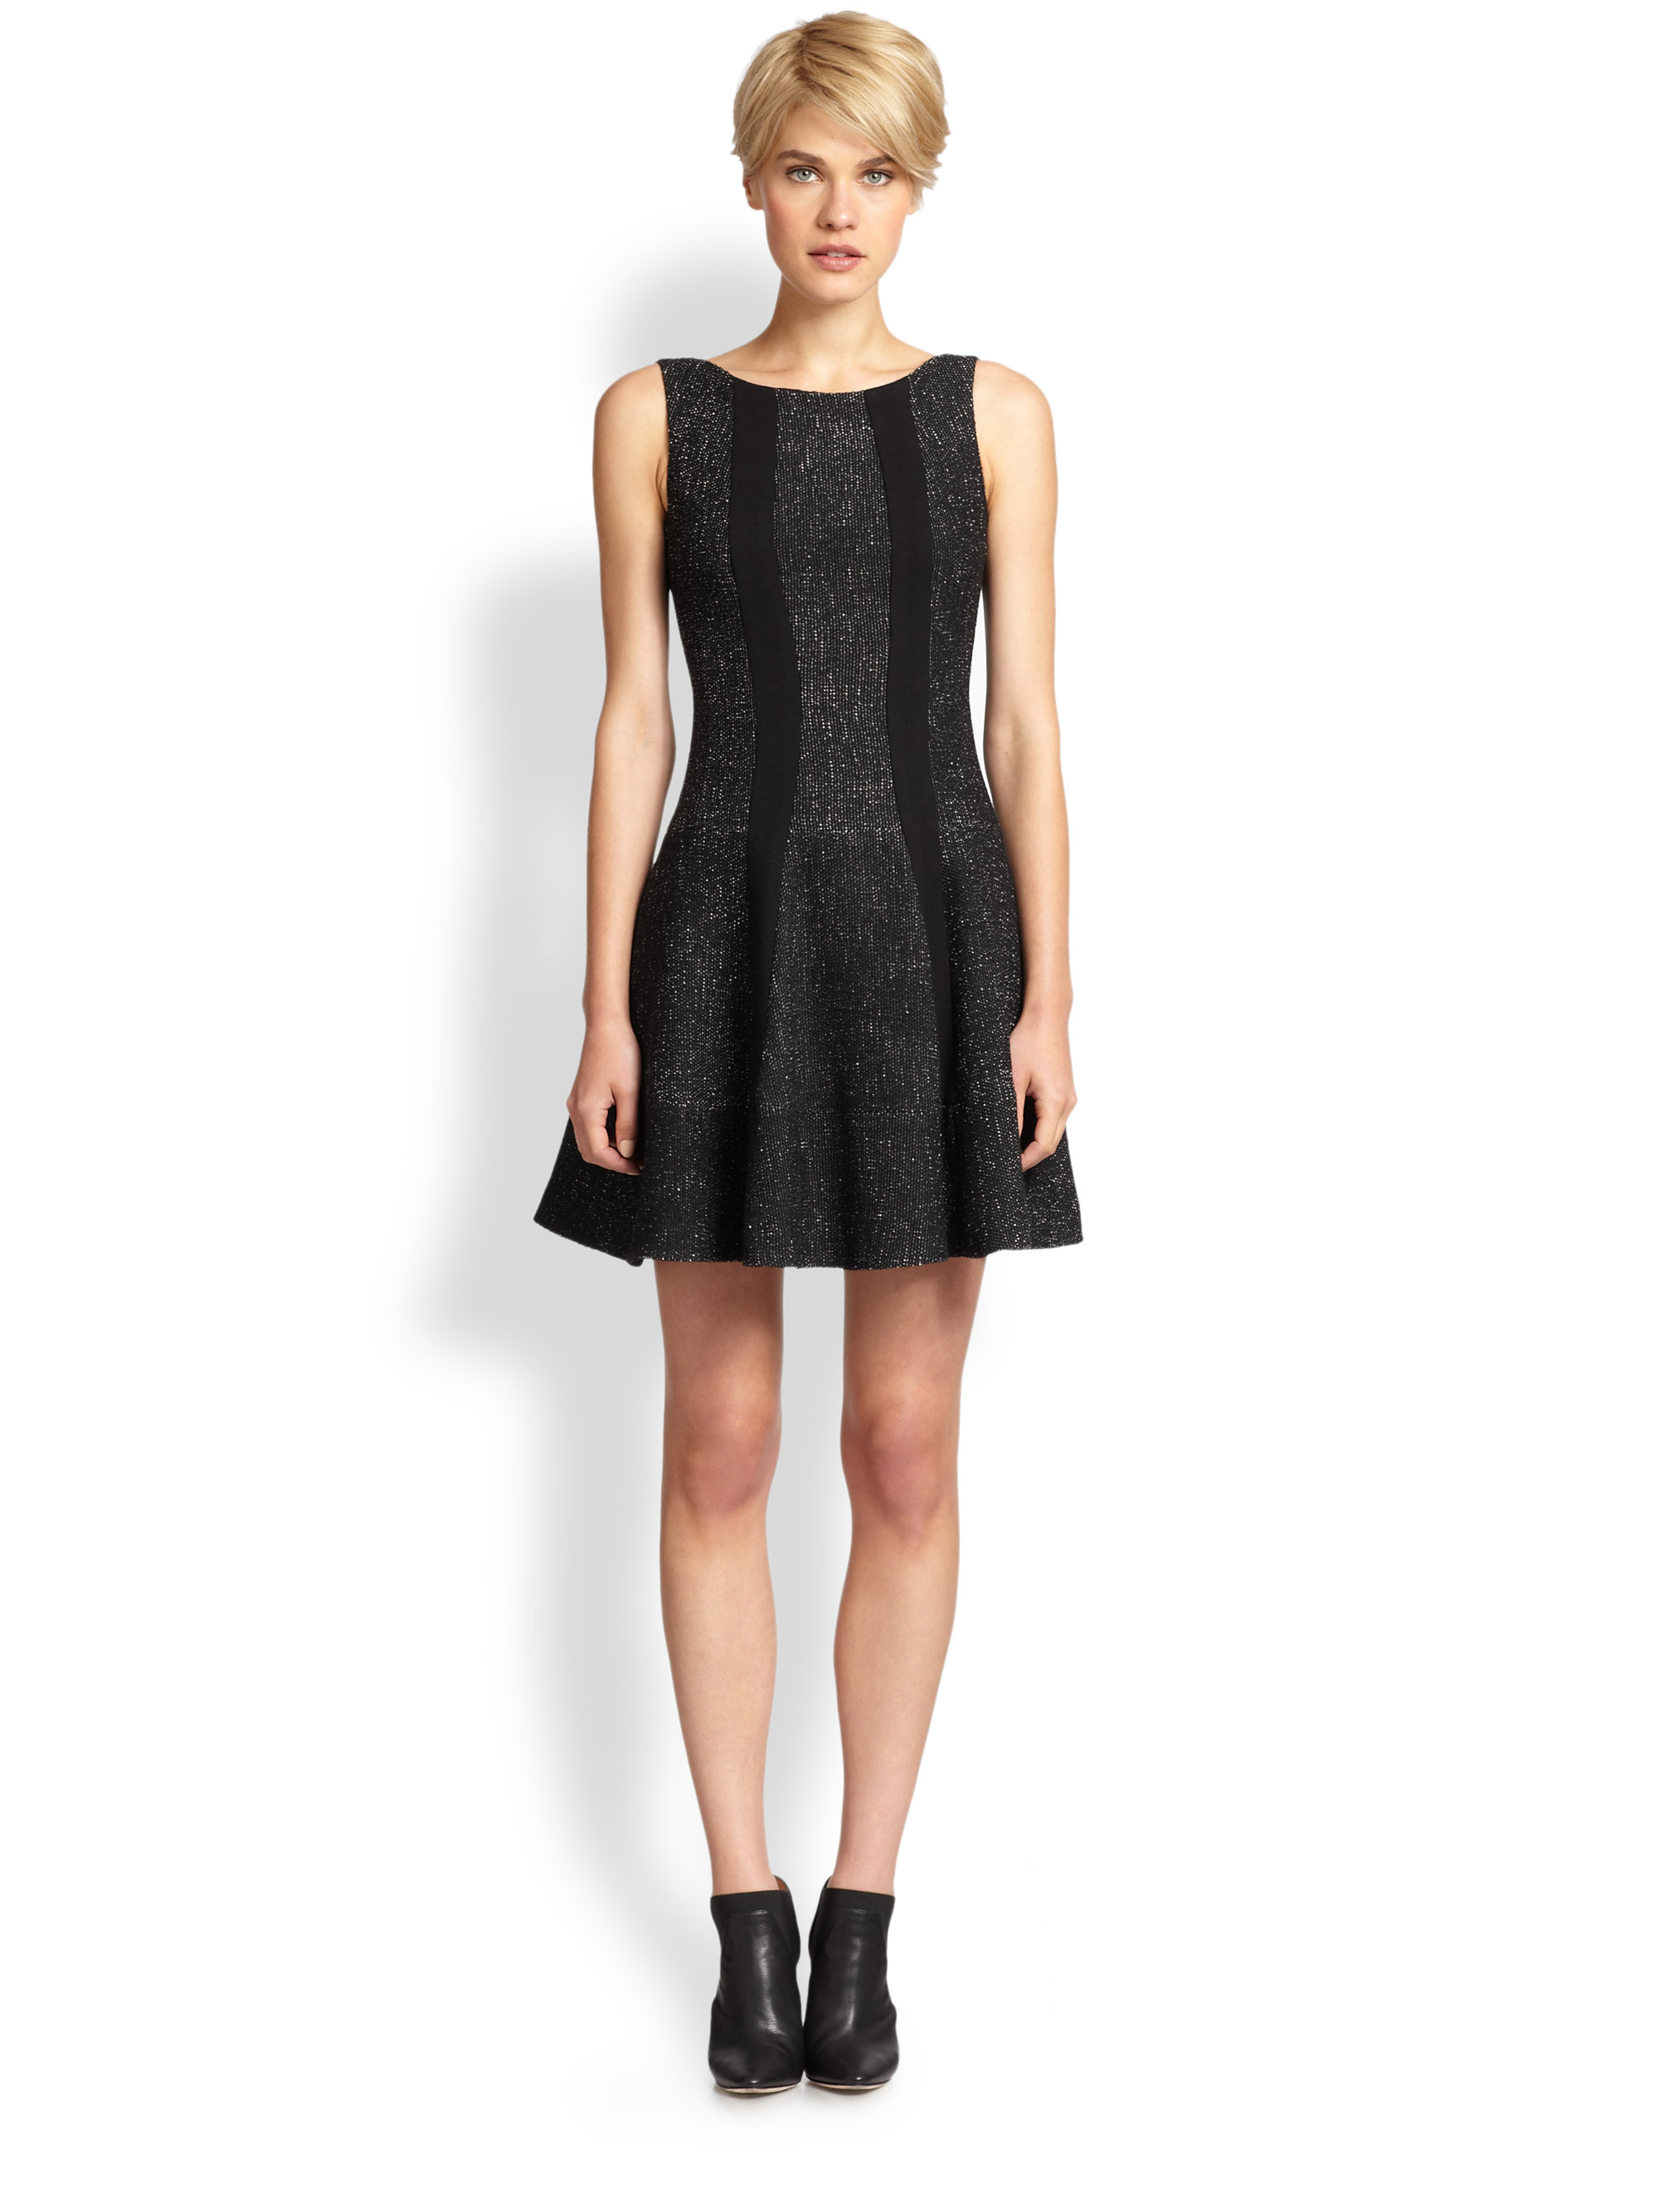 Nanette Lepore Clandestine Dress In Black Lyst